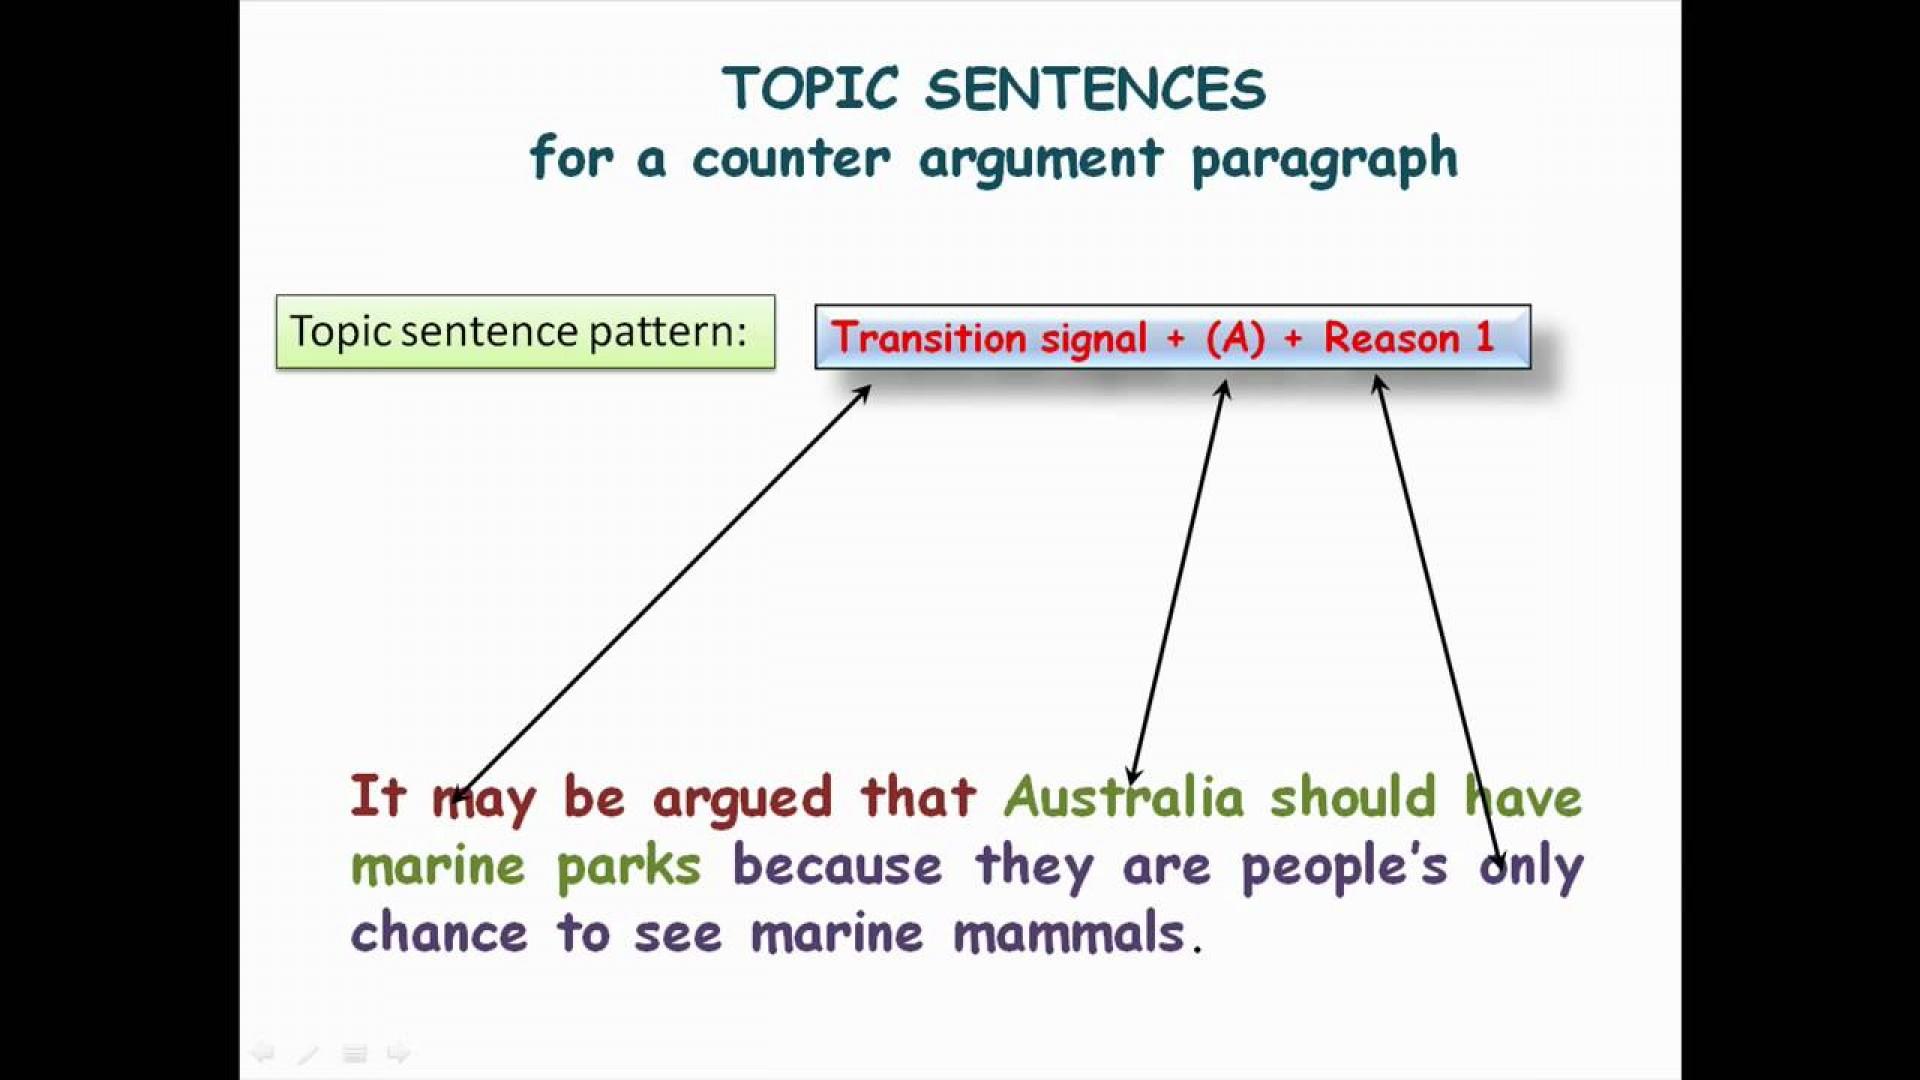 013 Maxresdefault Counter Argument Essay Imposing Ideas Topics 1920